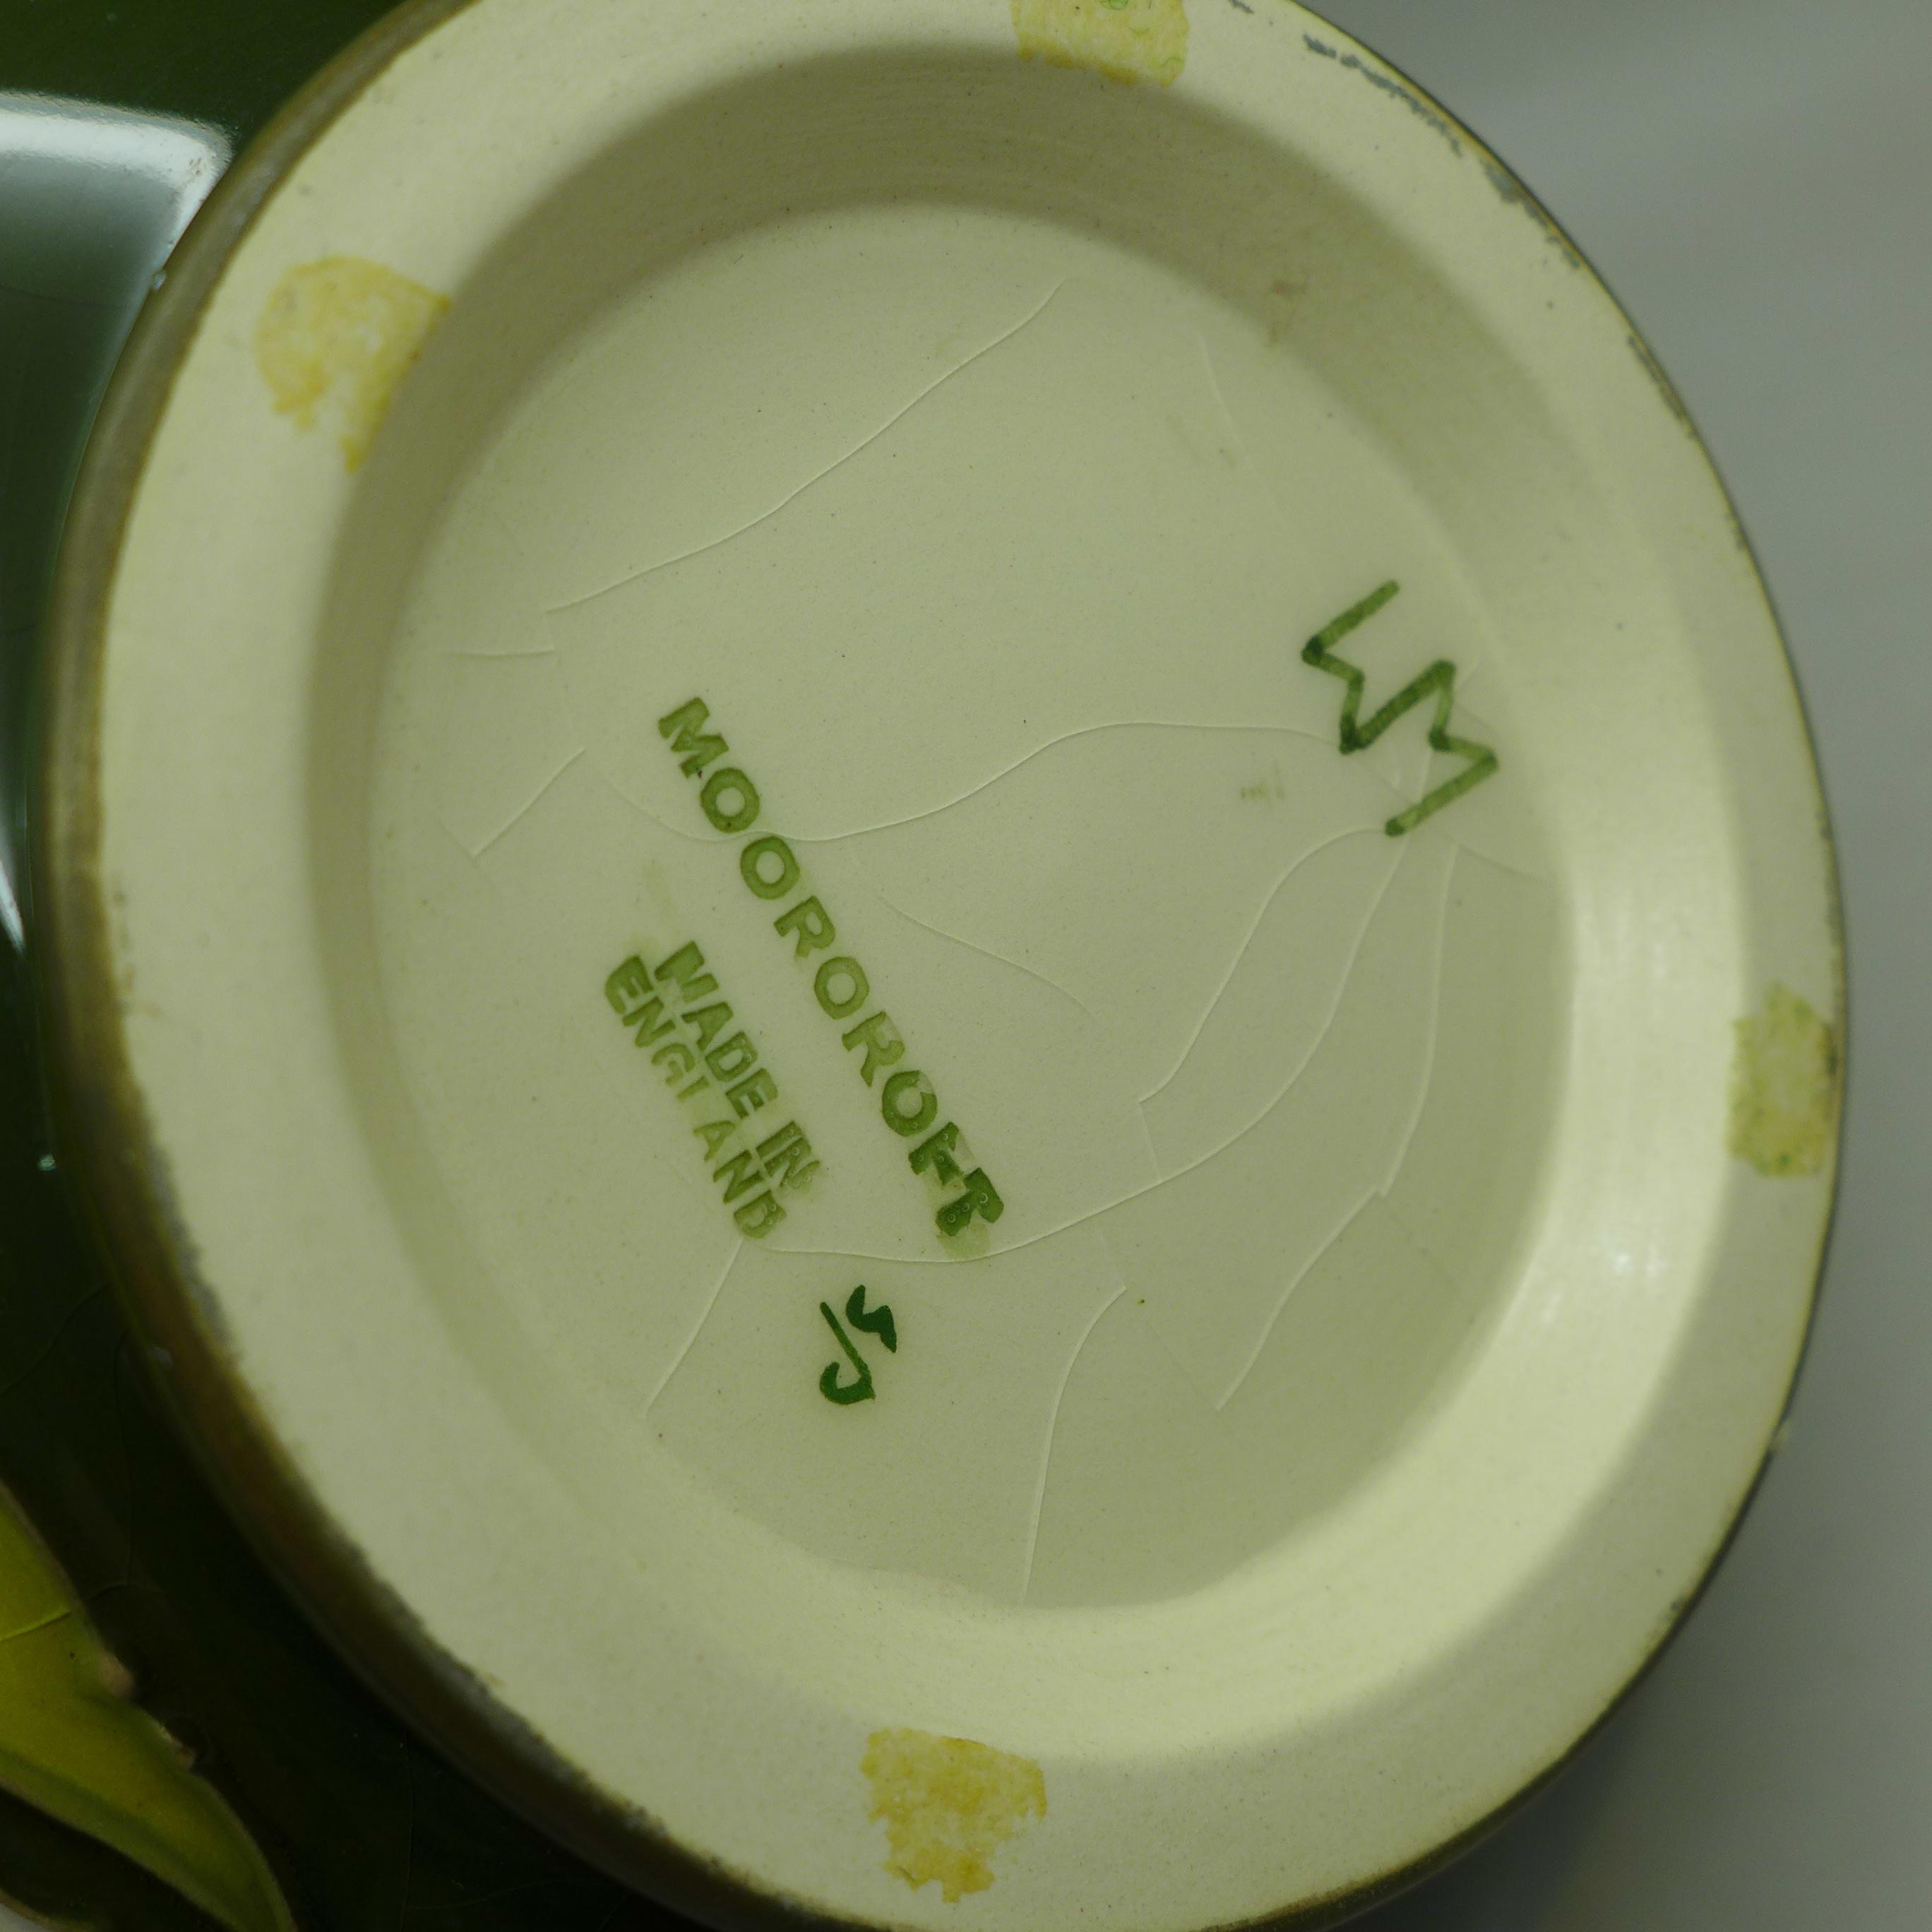 A Moorcroft Bermuda Lily bowl, 163mm diameter - Image 5 of 6